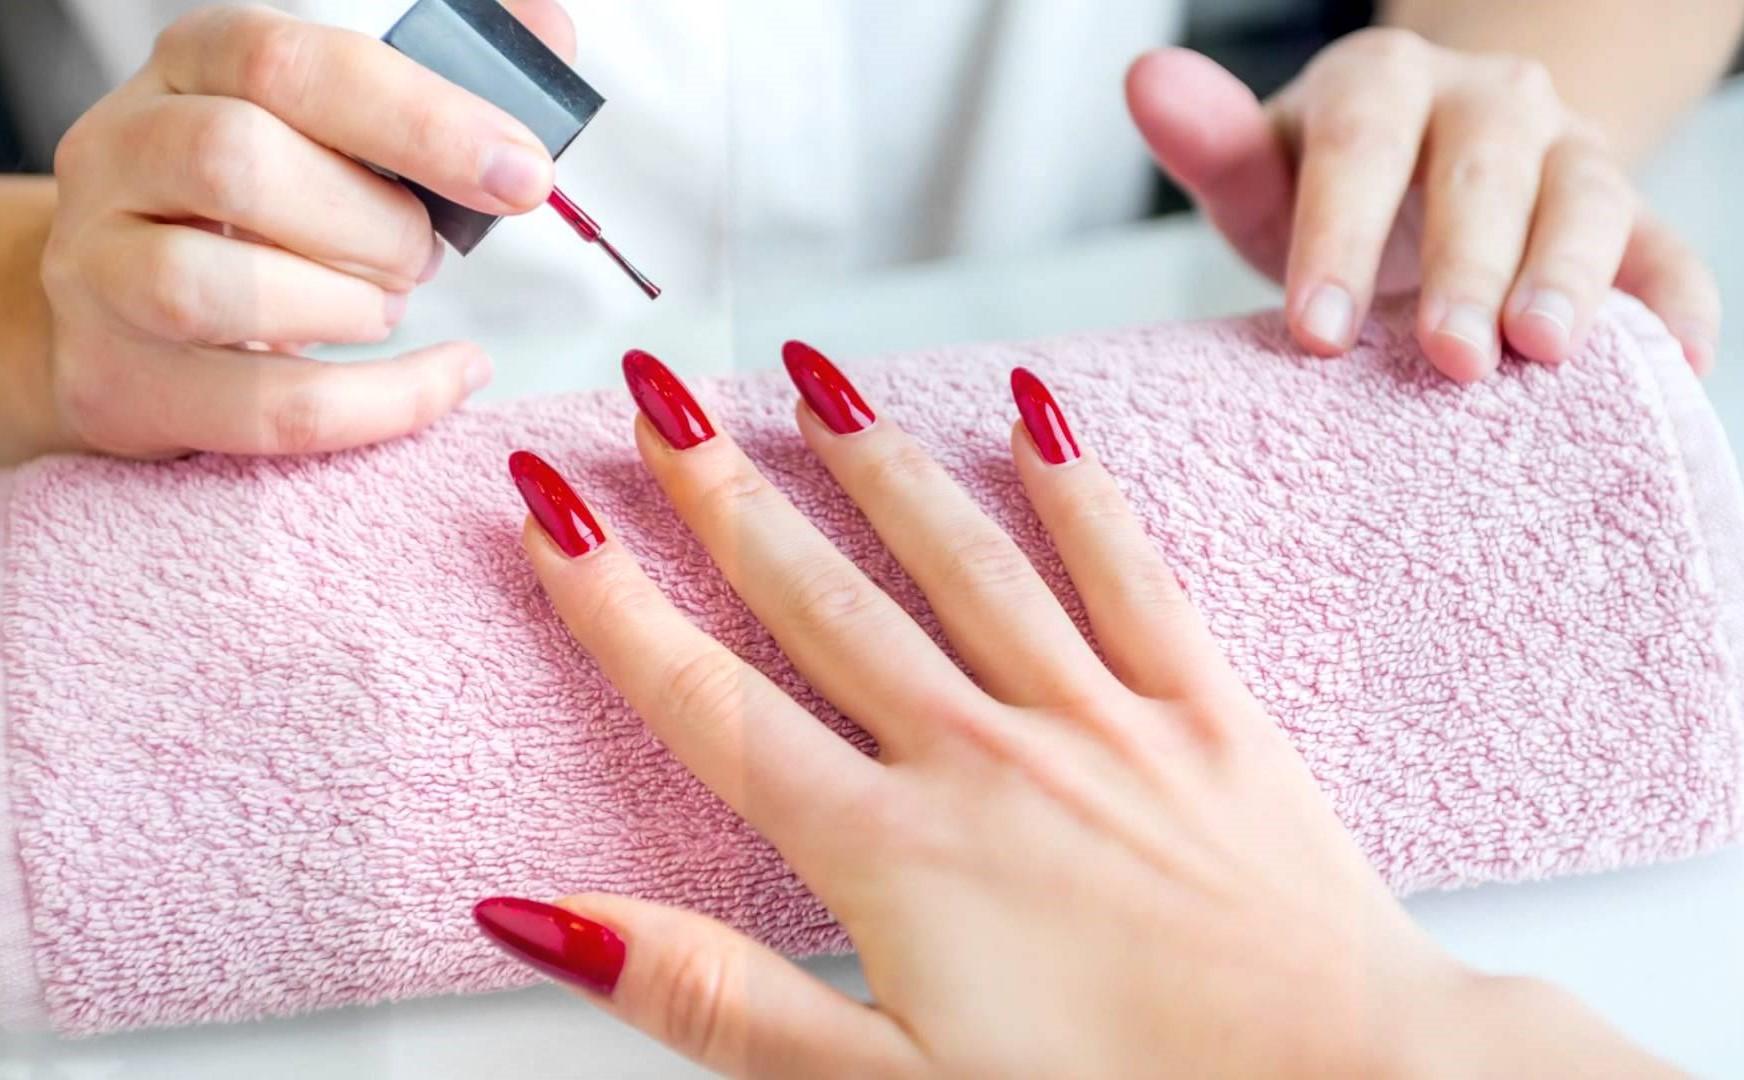 Как красиво накрасить лаком ногти фото